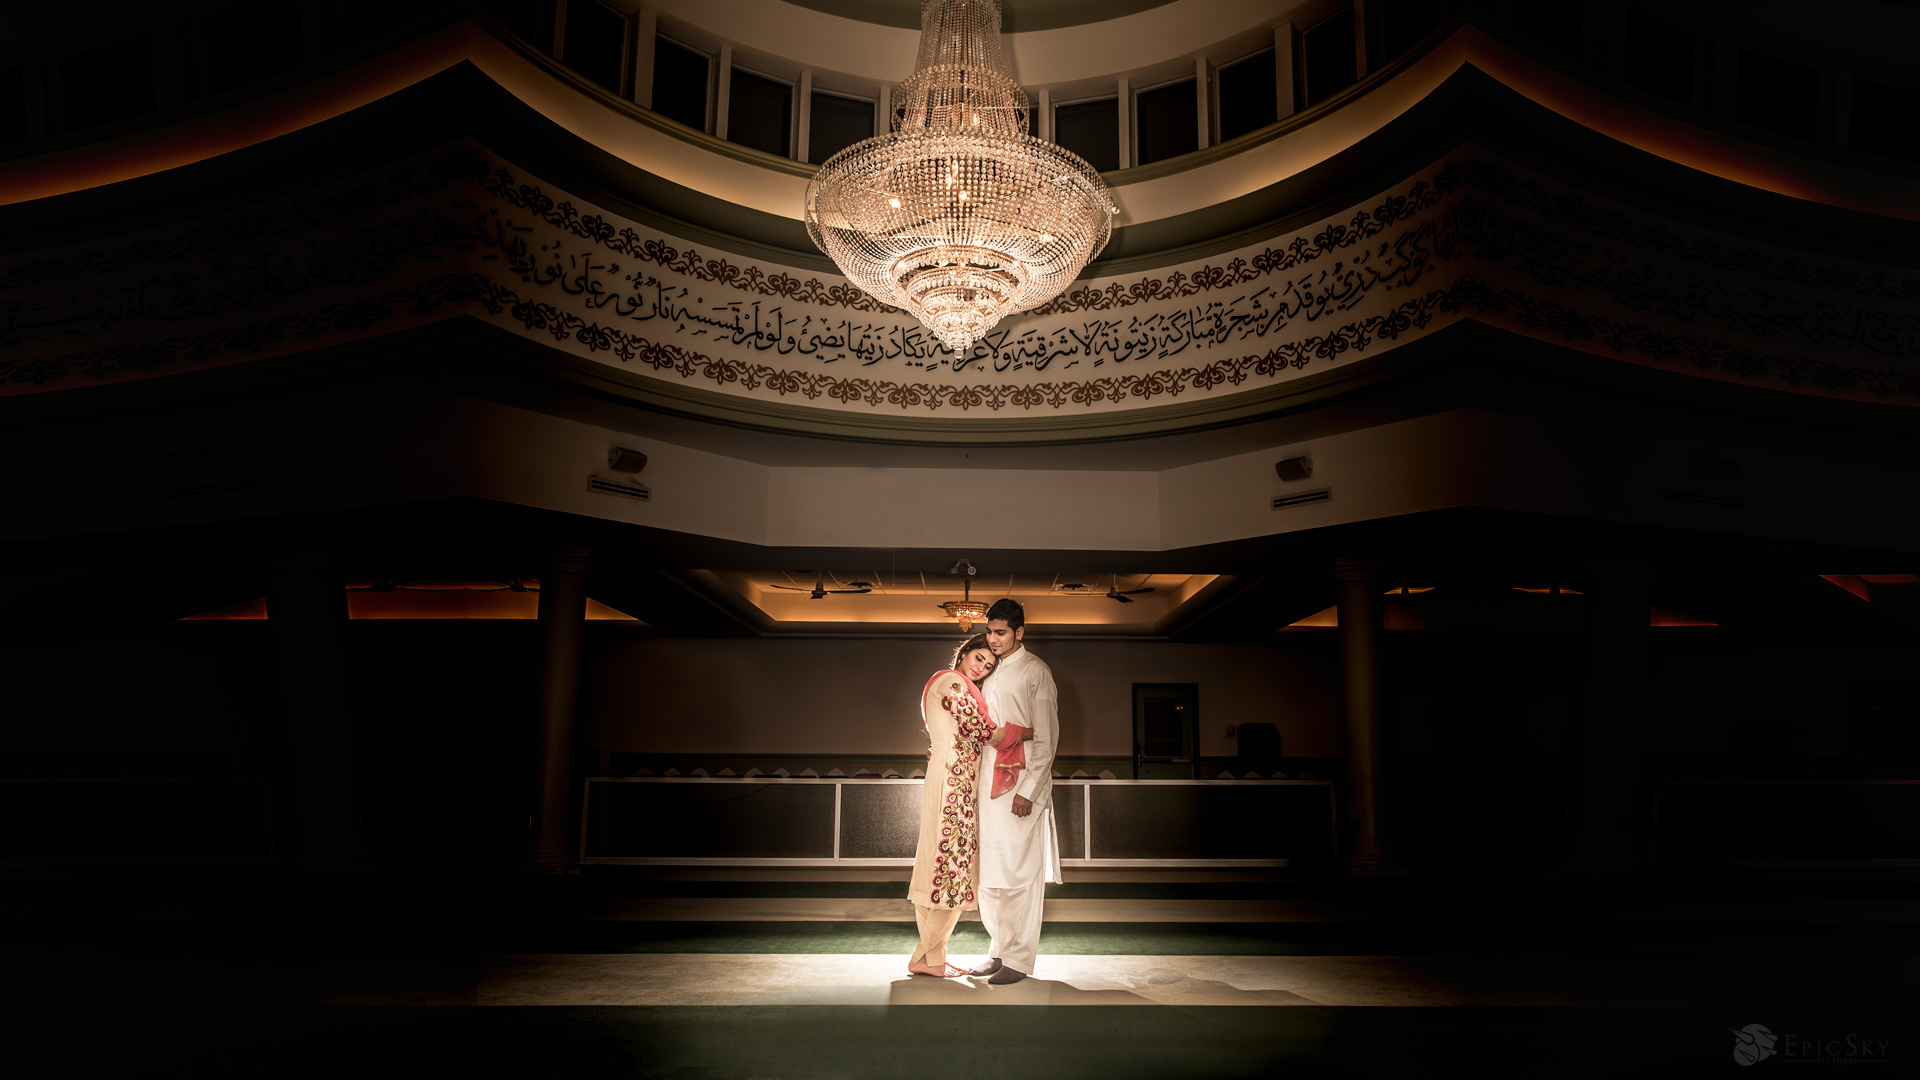 epic_sky_pictures_groomtobe_isna_photo_ceremony_wedding_muslim_event_toronto_vancouver_ontario_photography_services